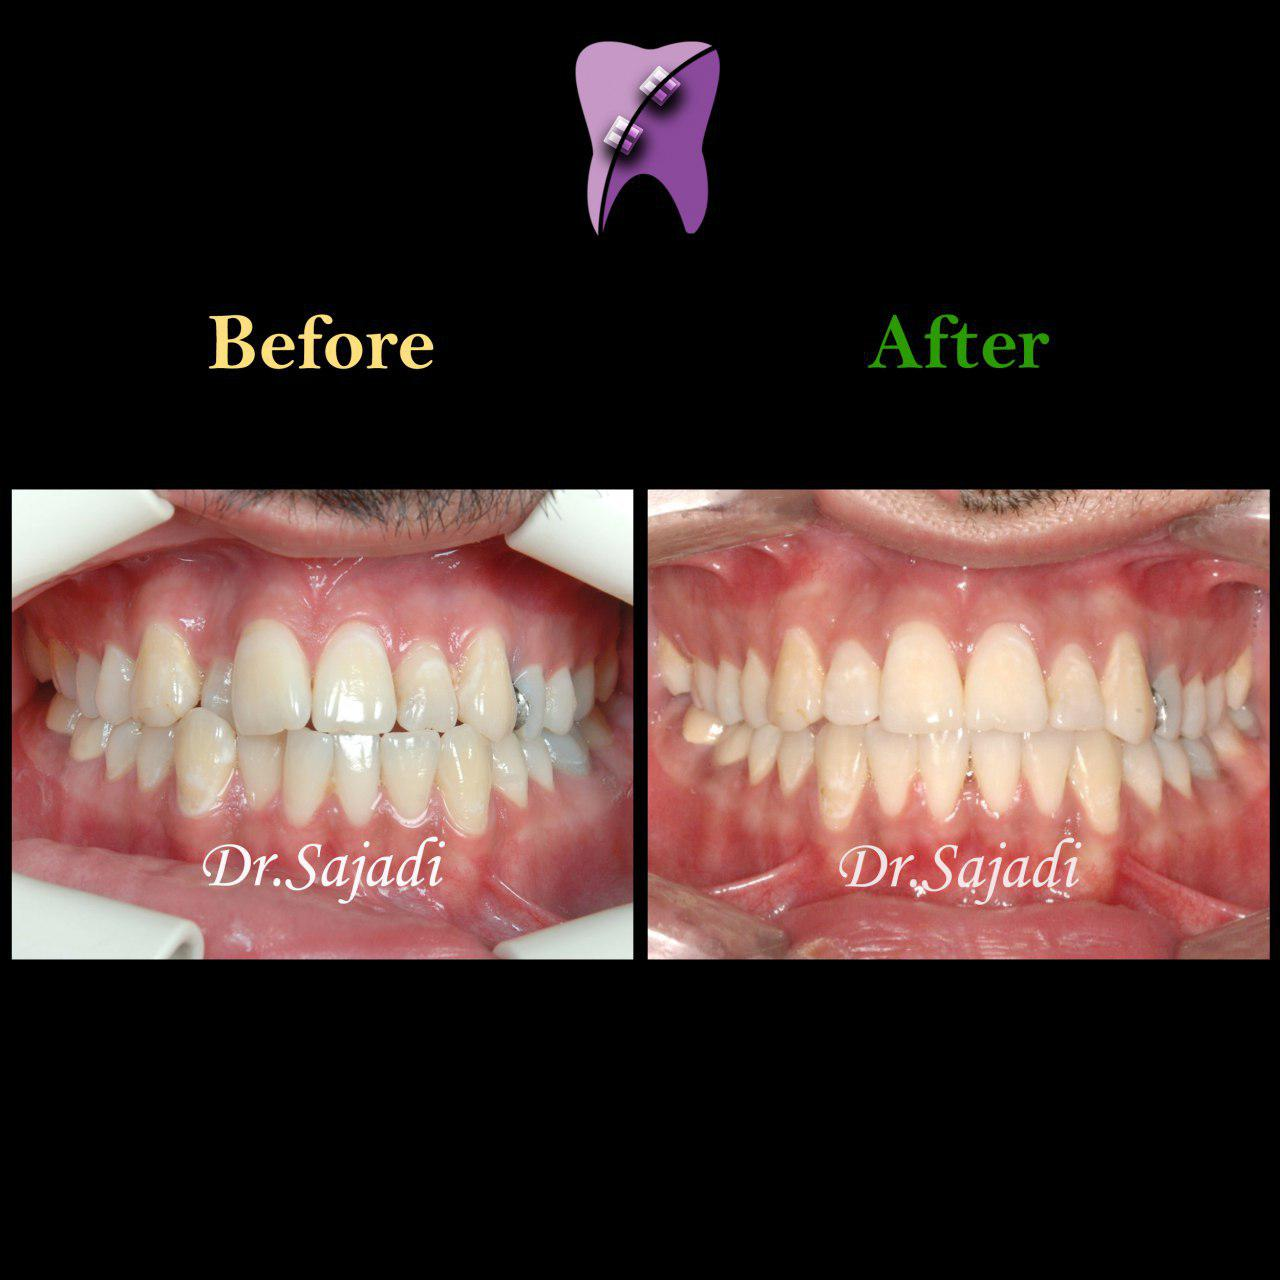 photo 2019 12 05 10 22 06 - درمان ارتودنسي برای انحراف میدلاین دندان هاي فك بالا